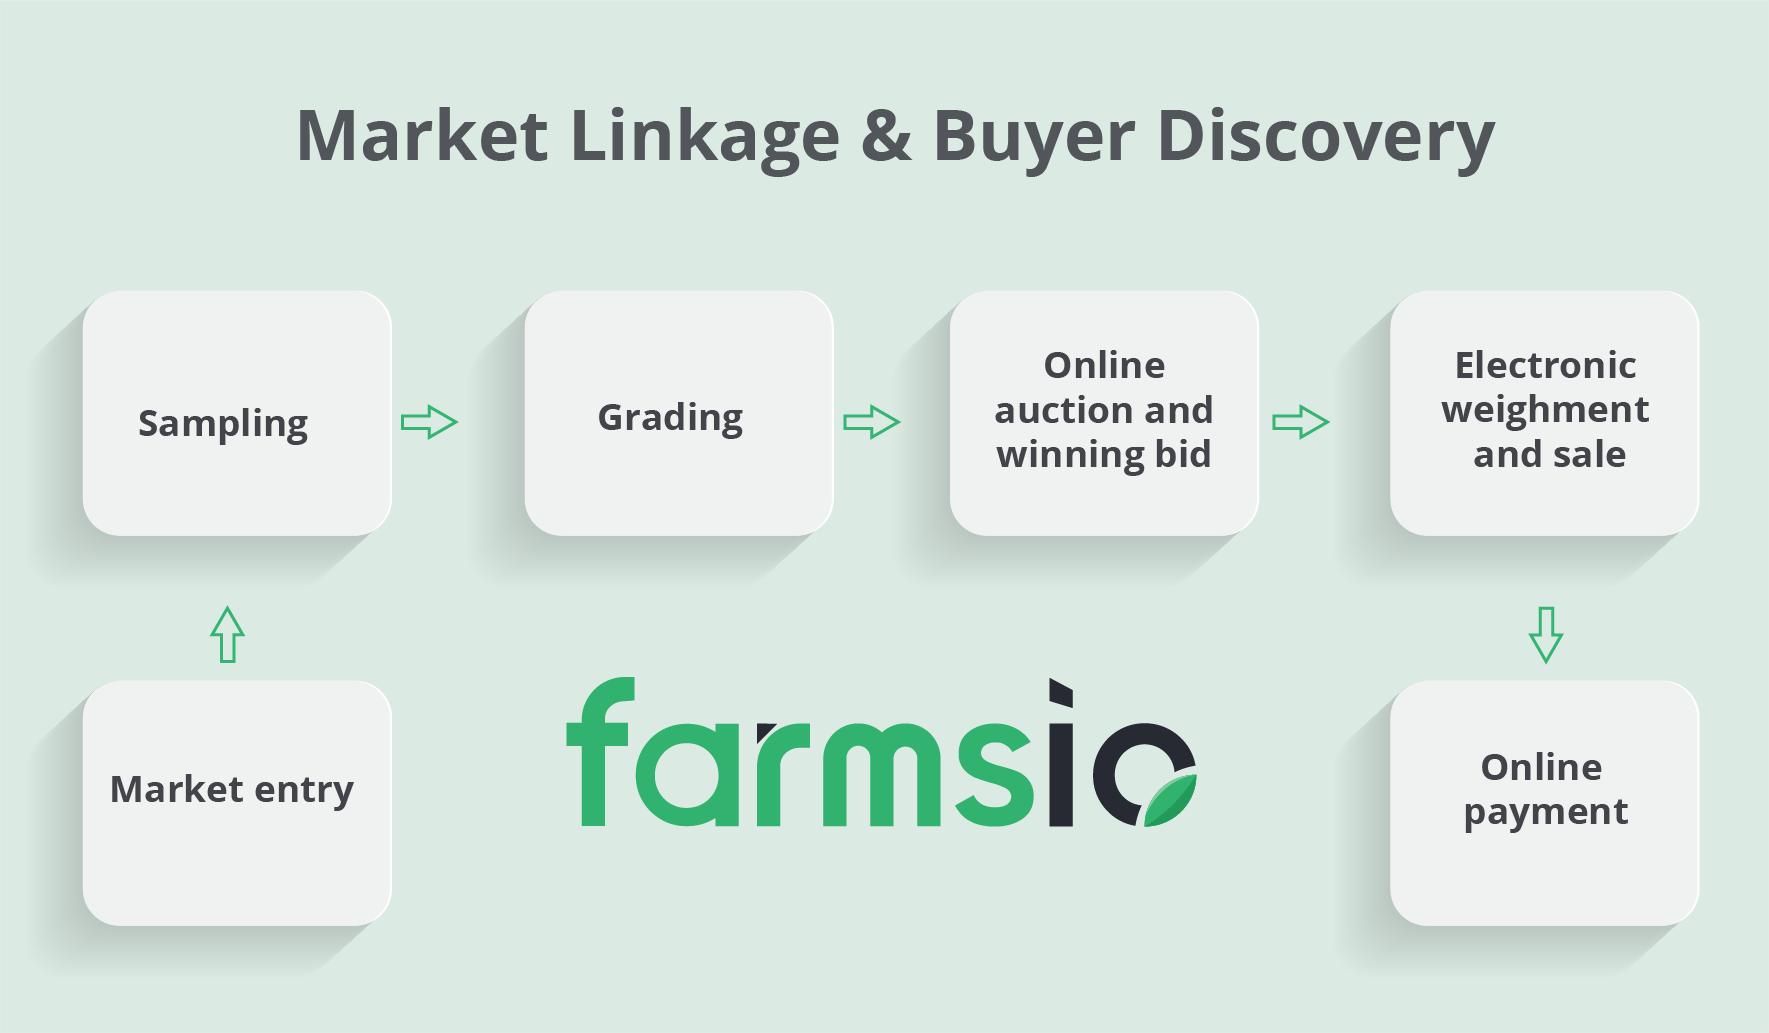 Farmsio Farm Management Software Marketplace module facilitate Market Linkage & Buyer Discovery